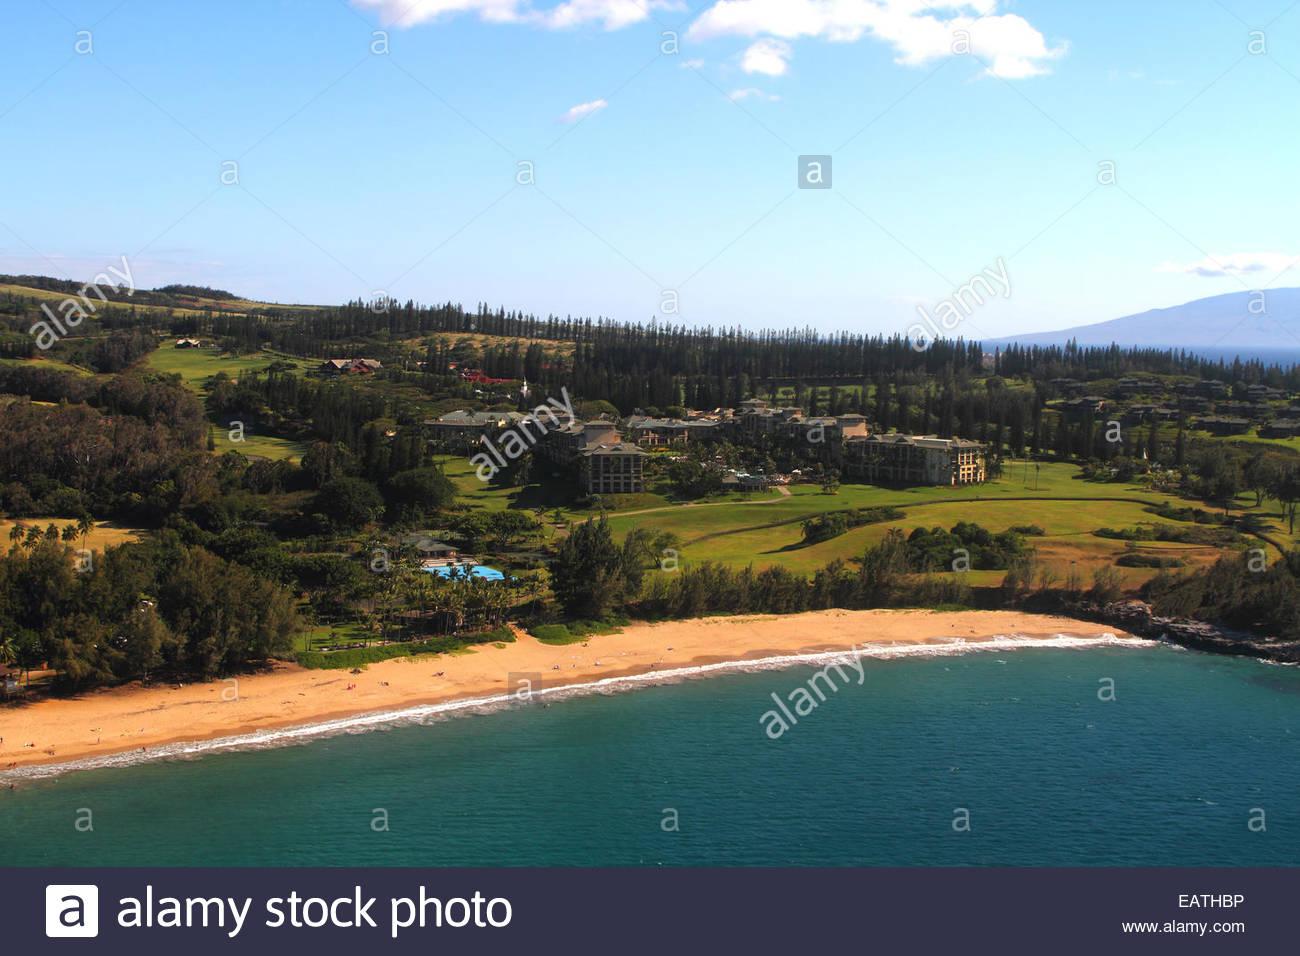 Aerial view of Flemings Beach in the Kapalua resort area. - Stock Image